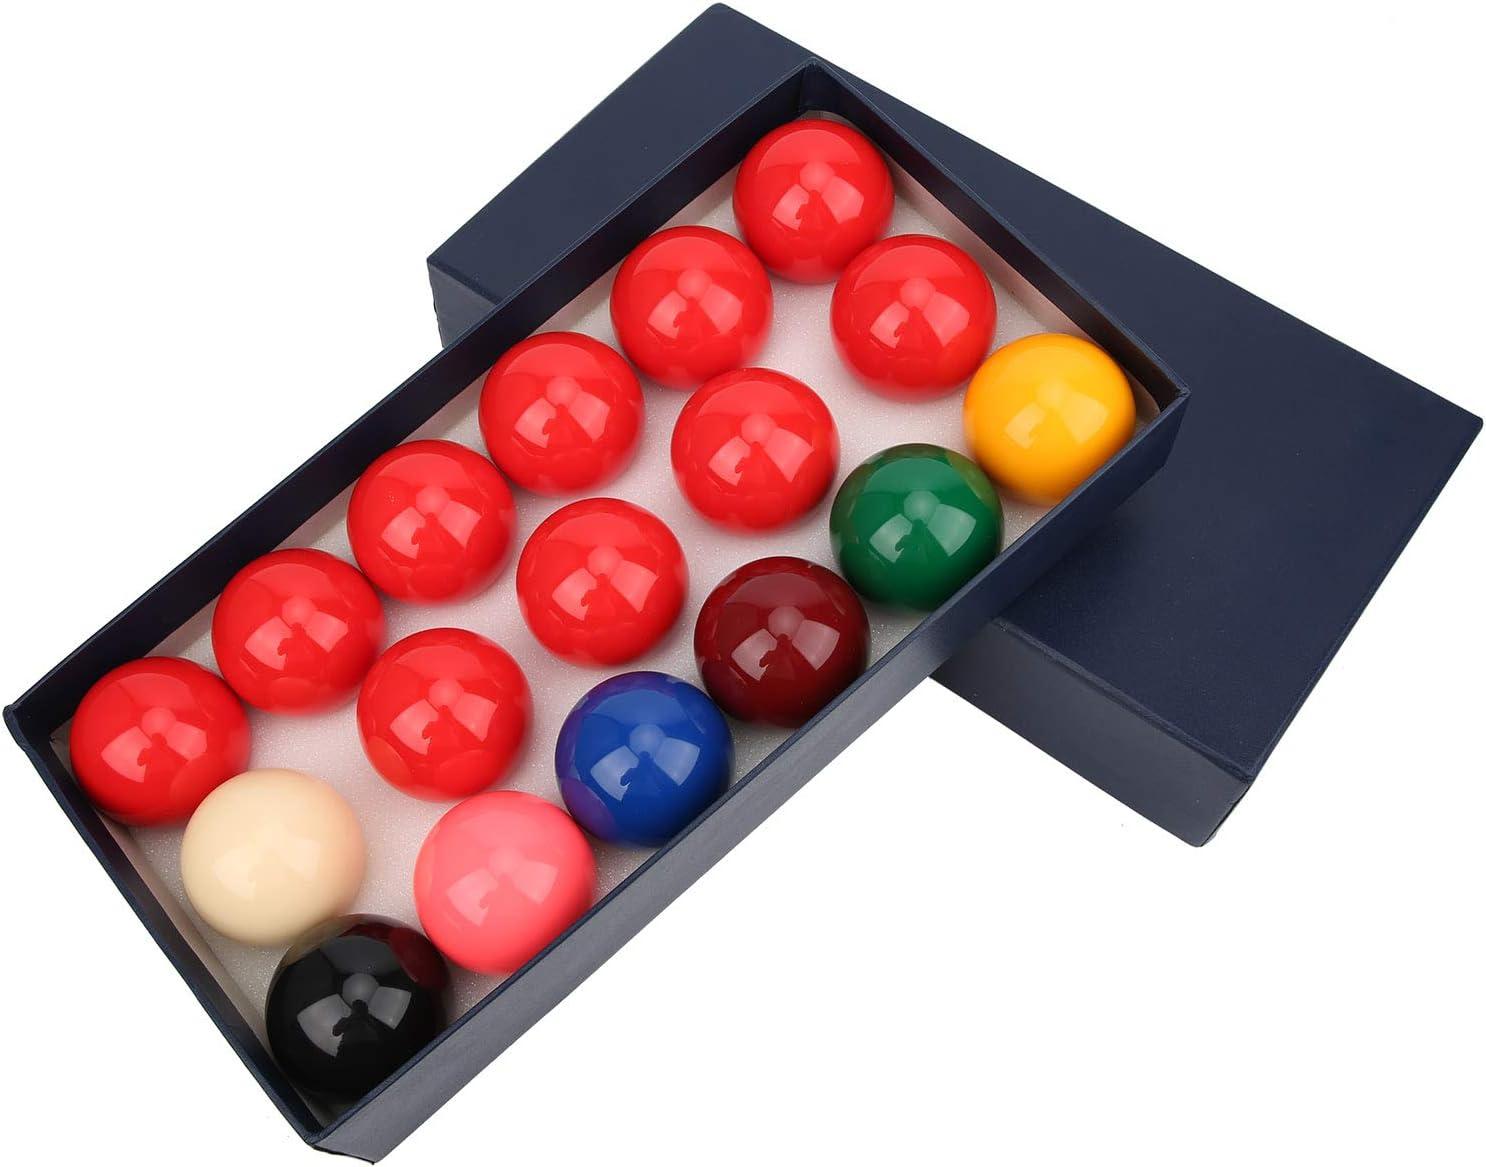 KIRSTHM Luxury Billiard Balls 1Set Snooker Billiards 5 Pool Selling rankings Sports Cue